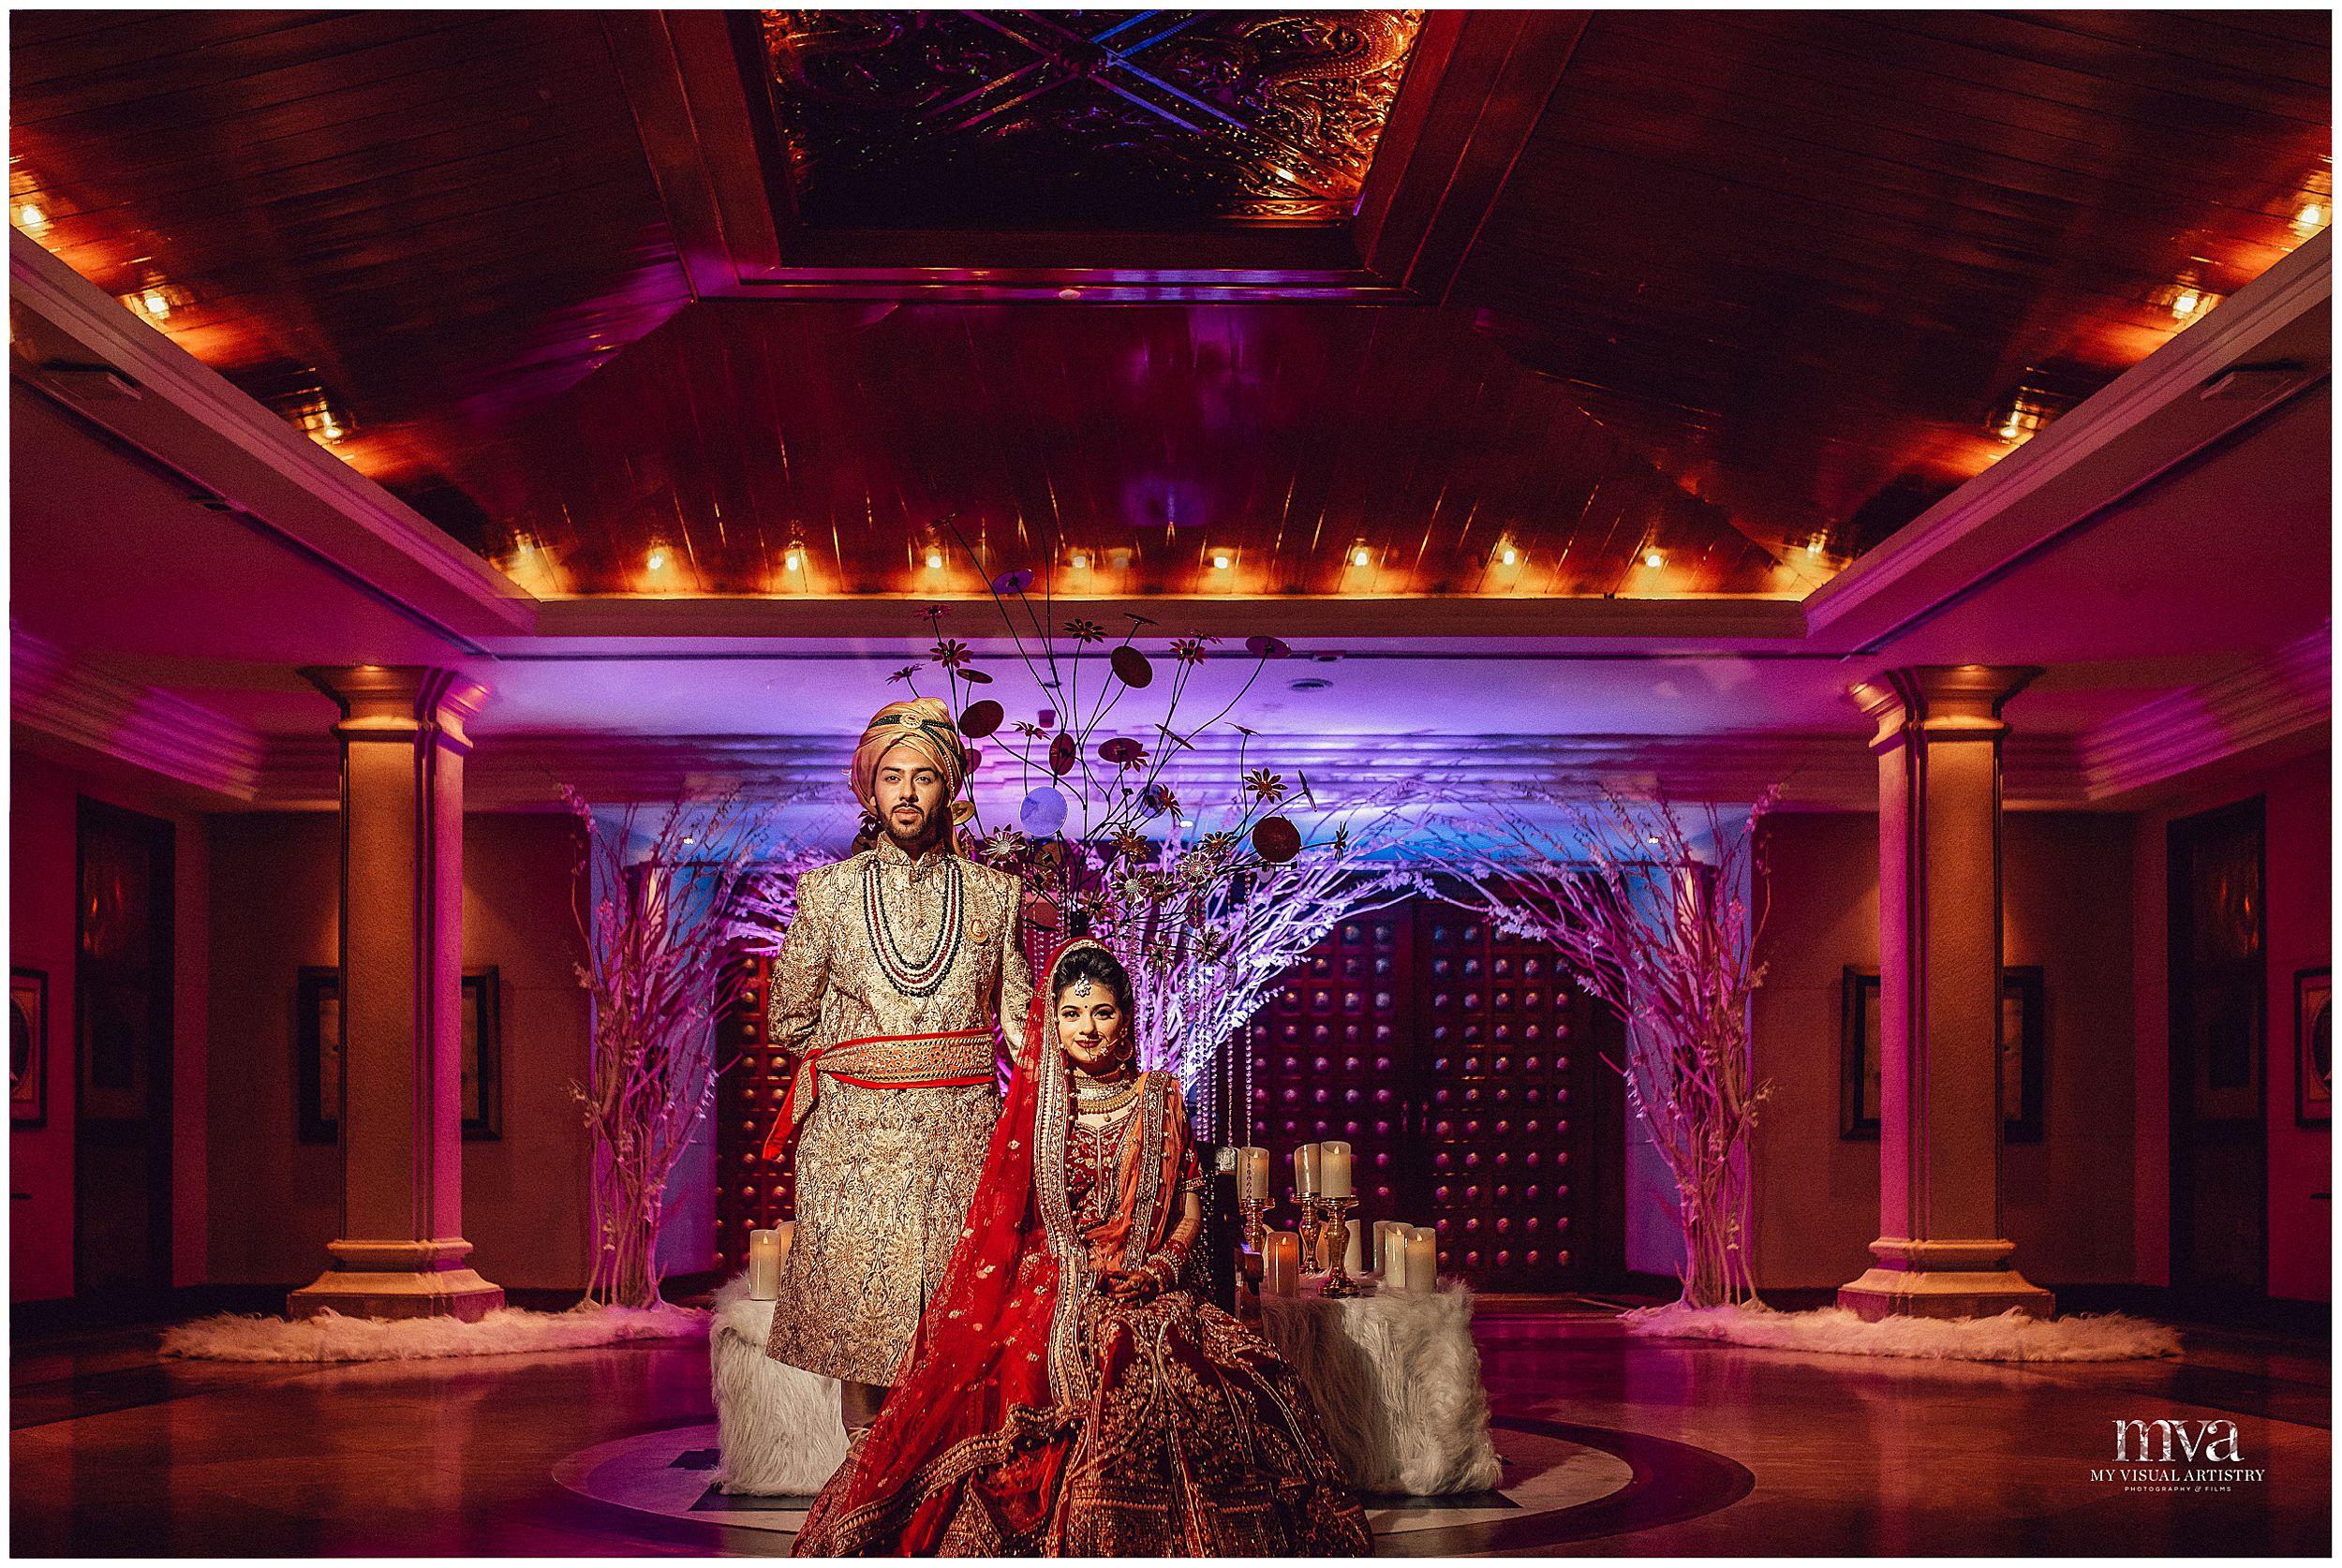 SONAAL_AMI_MYVISUALARTISTRY_WEDDING_PHOTOGRAPHY_MVA_NEPAL_KATHMANDU_SOALTEE52.jpg